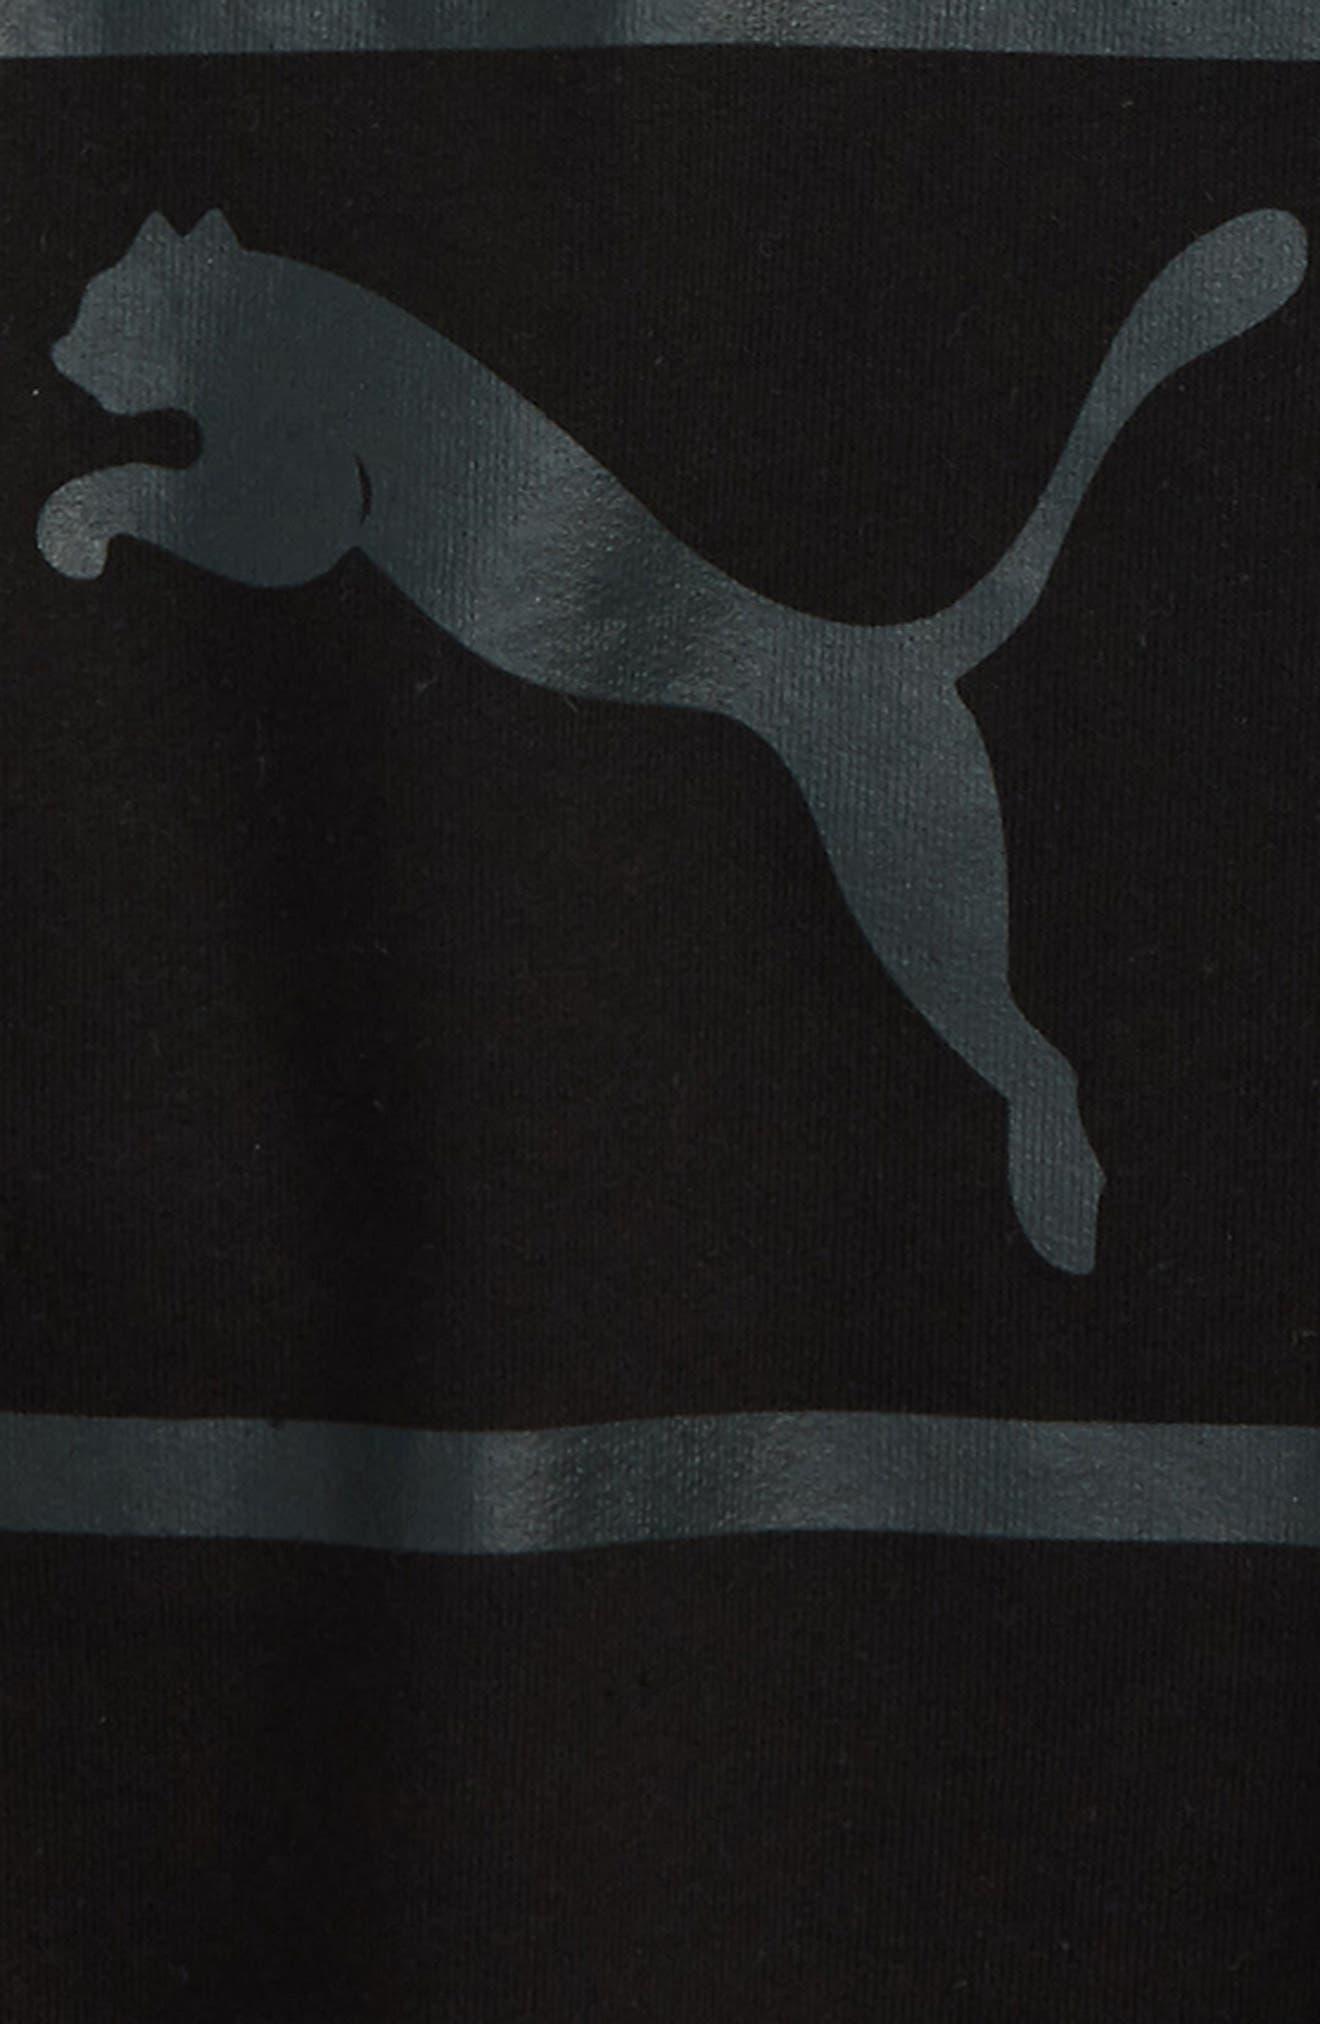 Heritage Logo Crewneck Sweatshirt,                             Alternate thumbnail 2, color,                             001